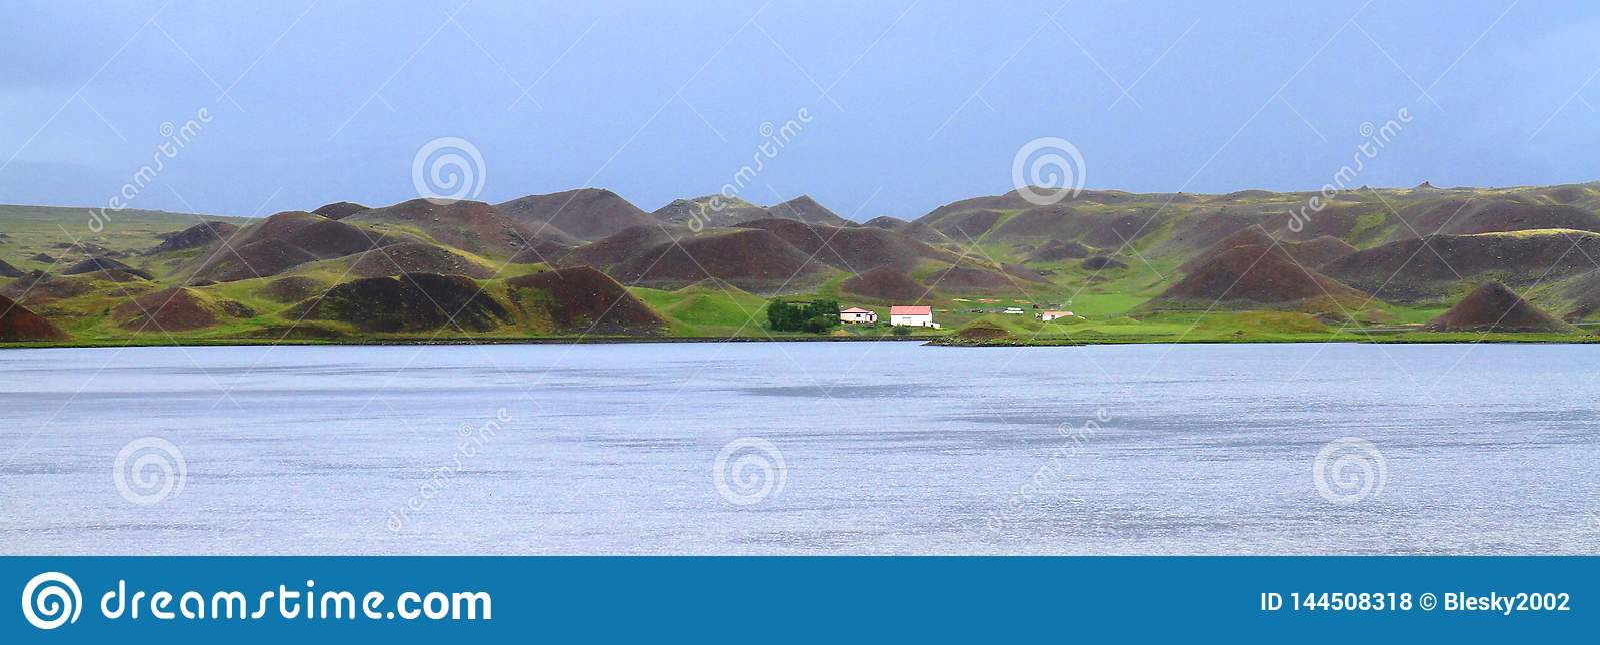 Isländsk countraside, norr Island